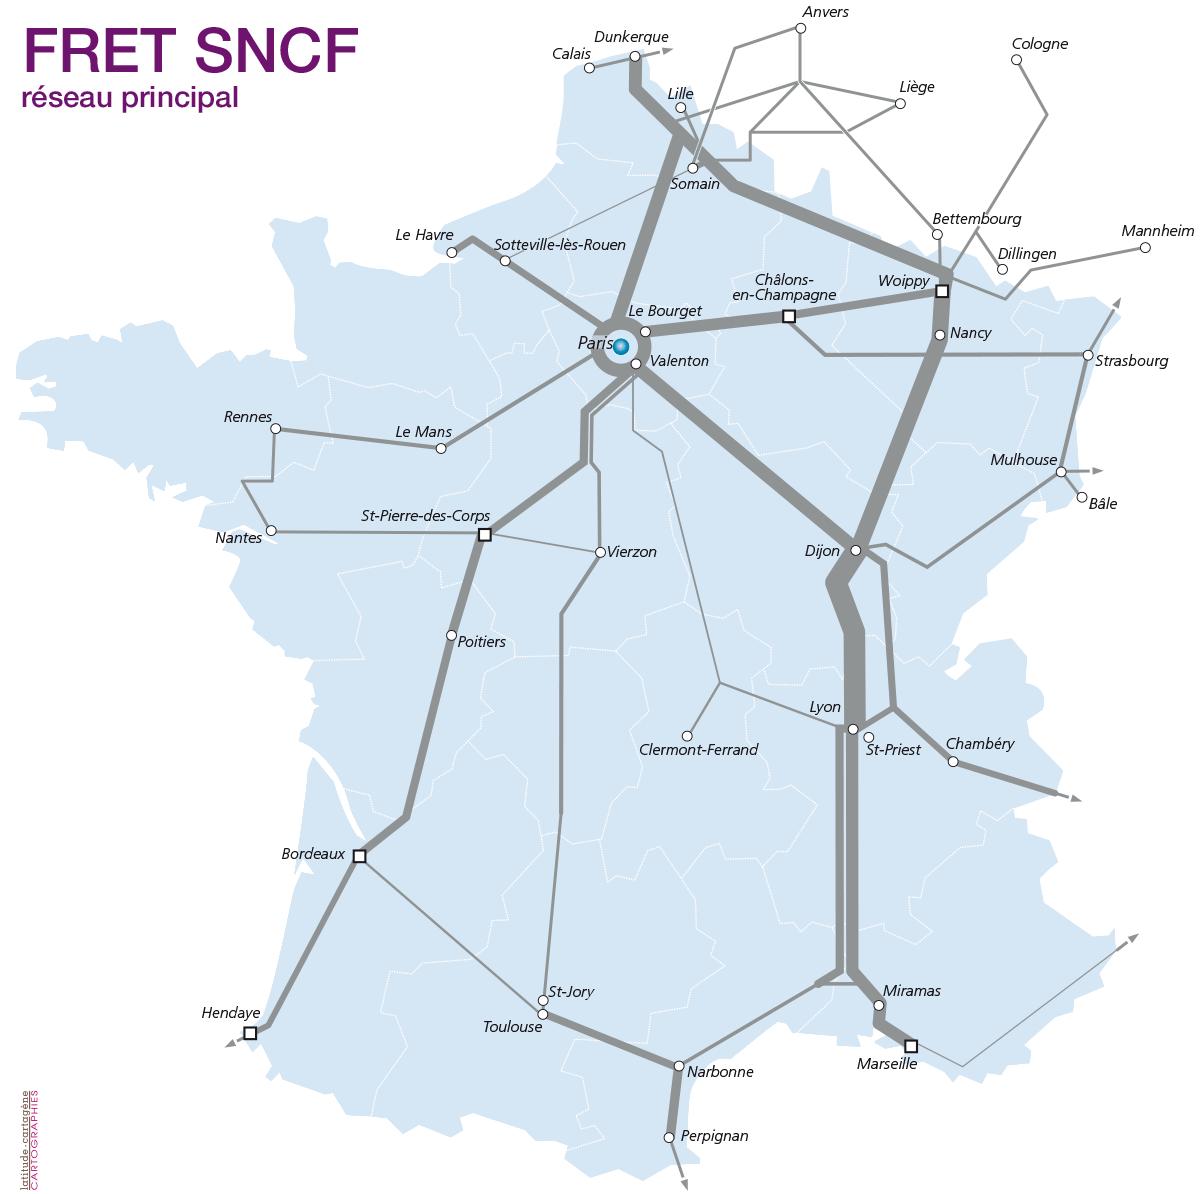 Distribution & hinterland (Fr) - Port-La Nouvelle